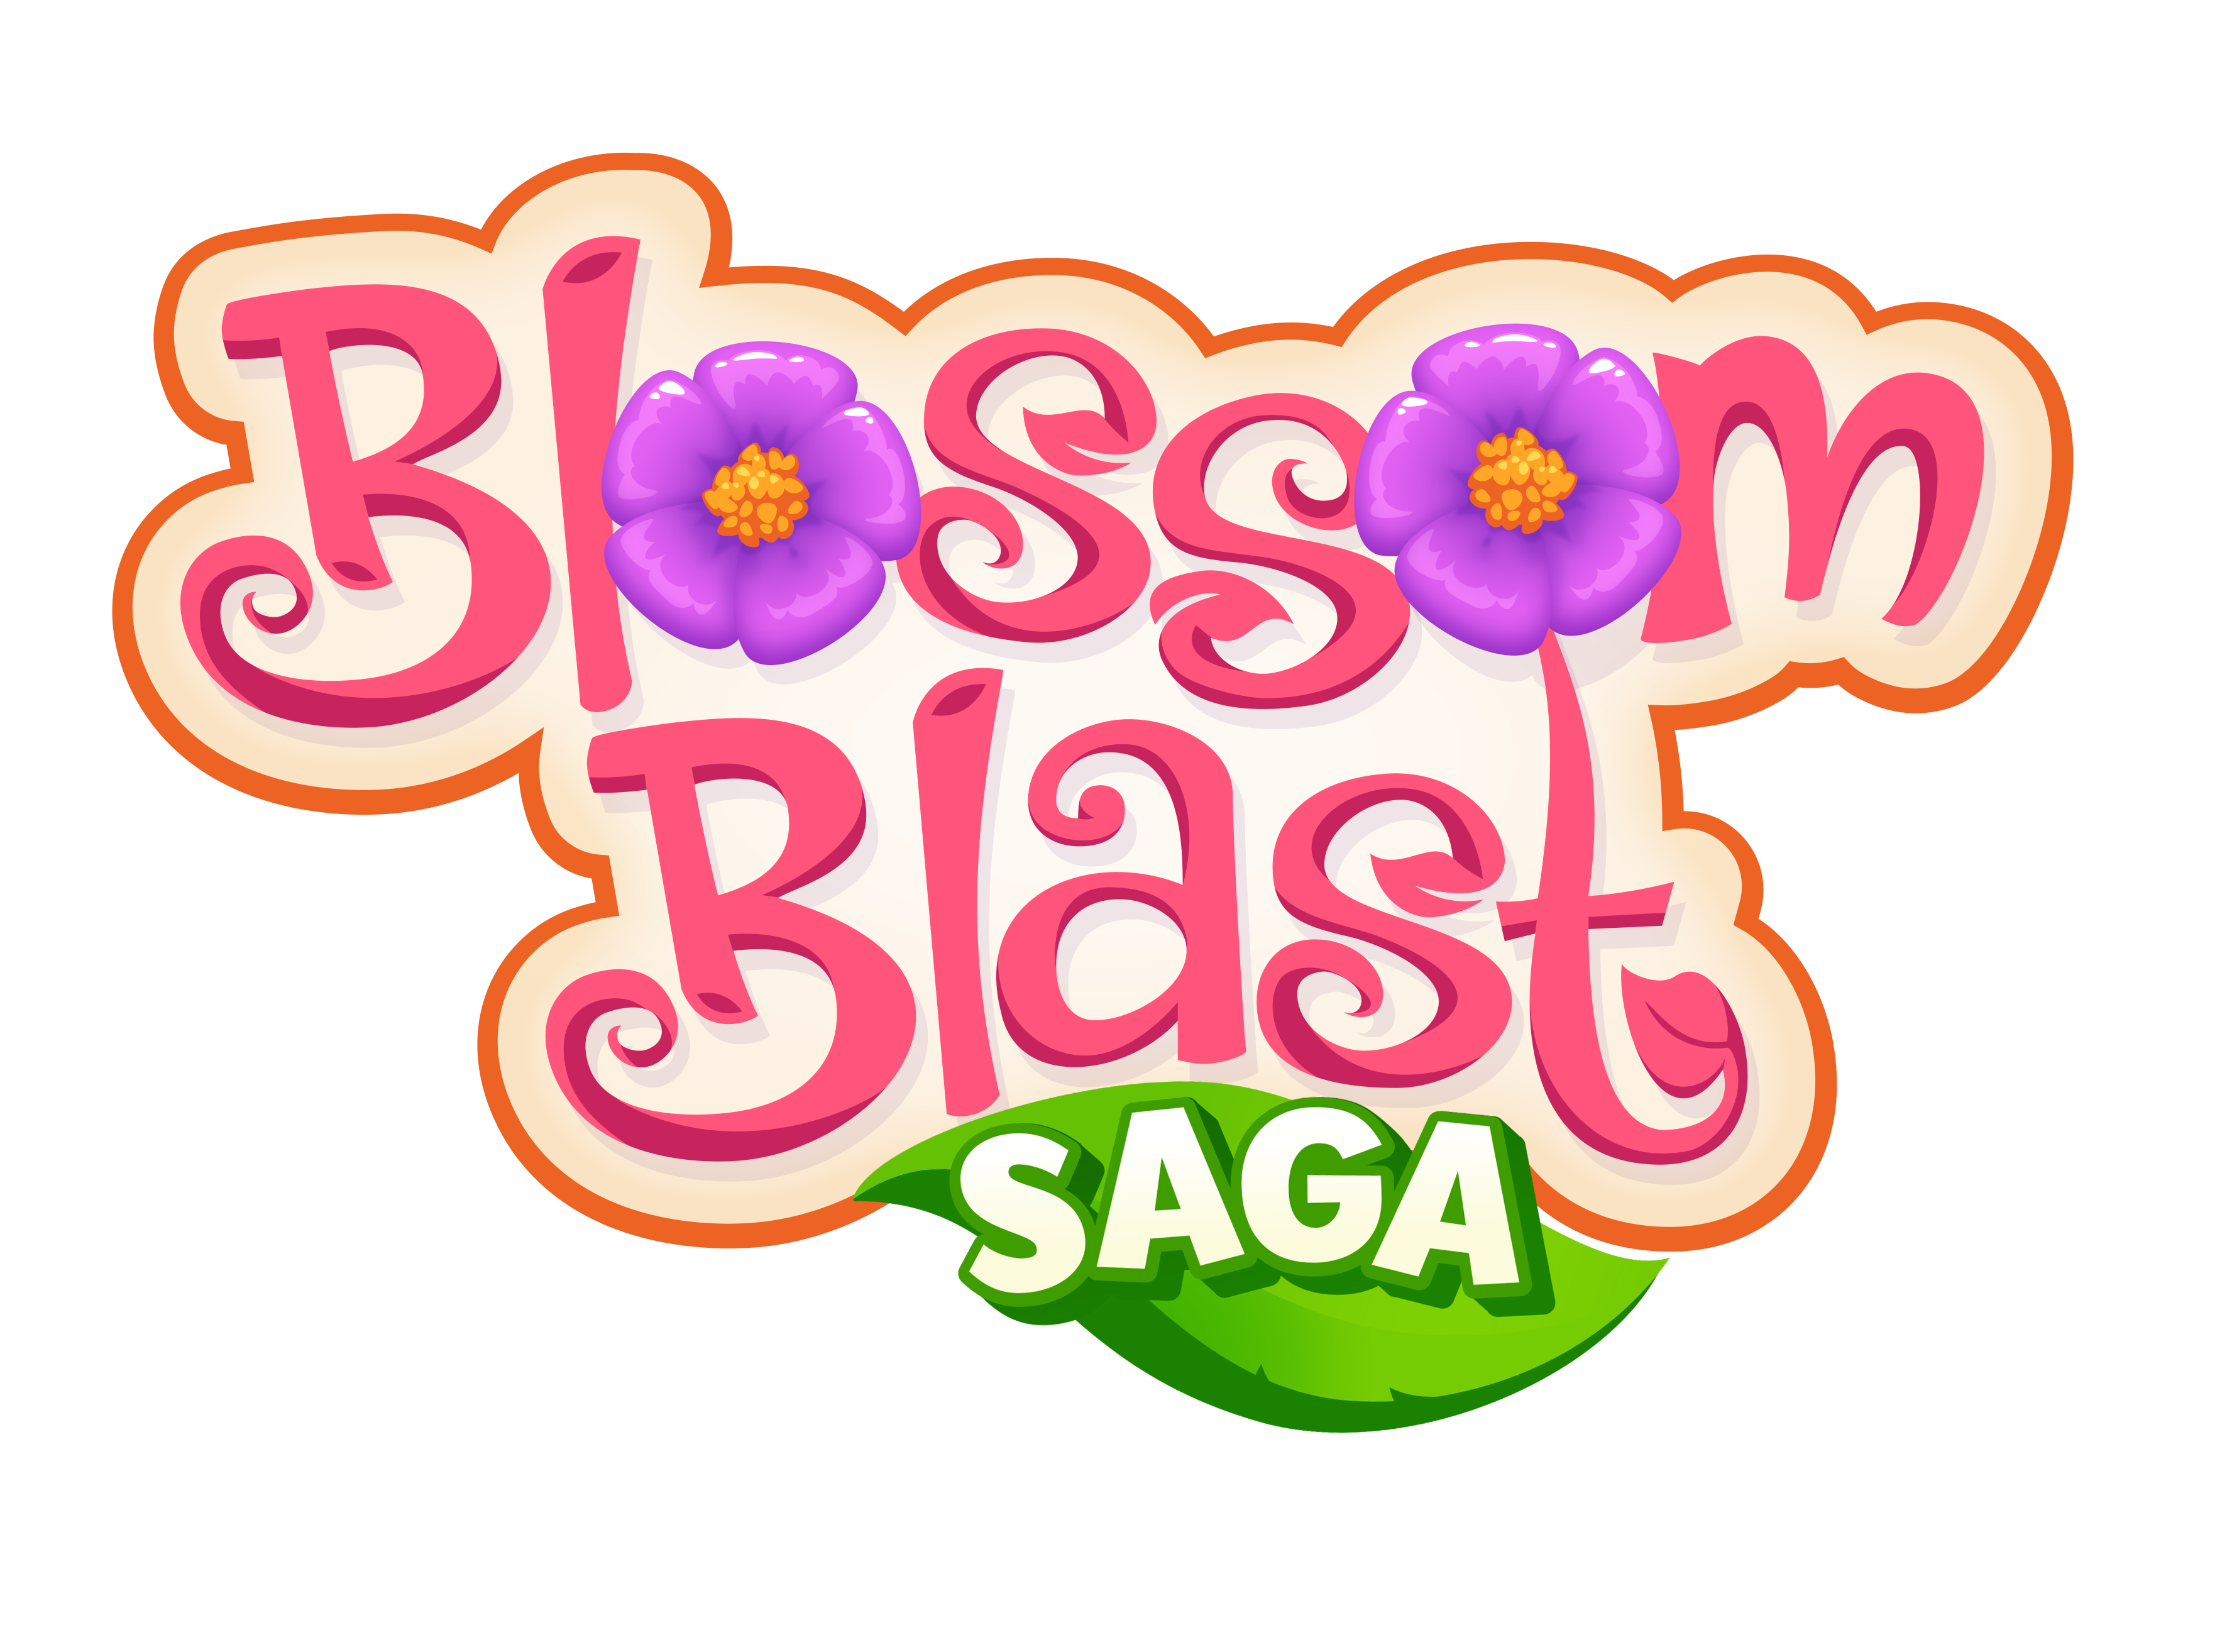 blossom blast saga - Google 검색